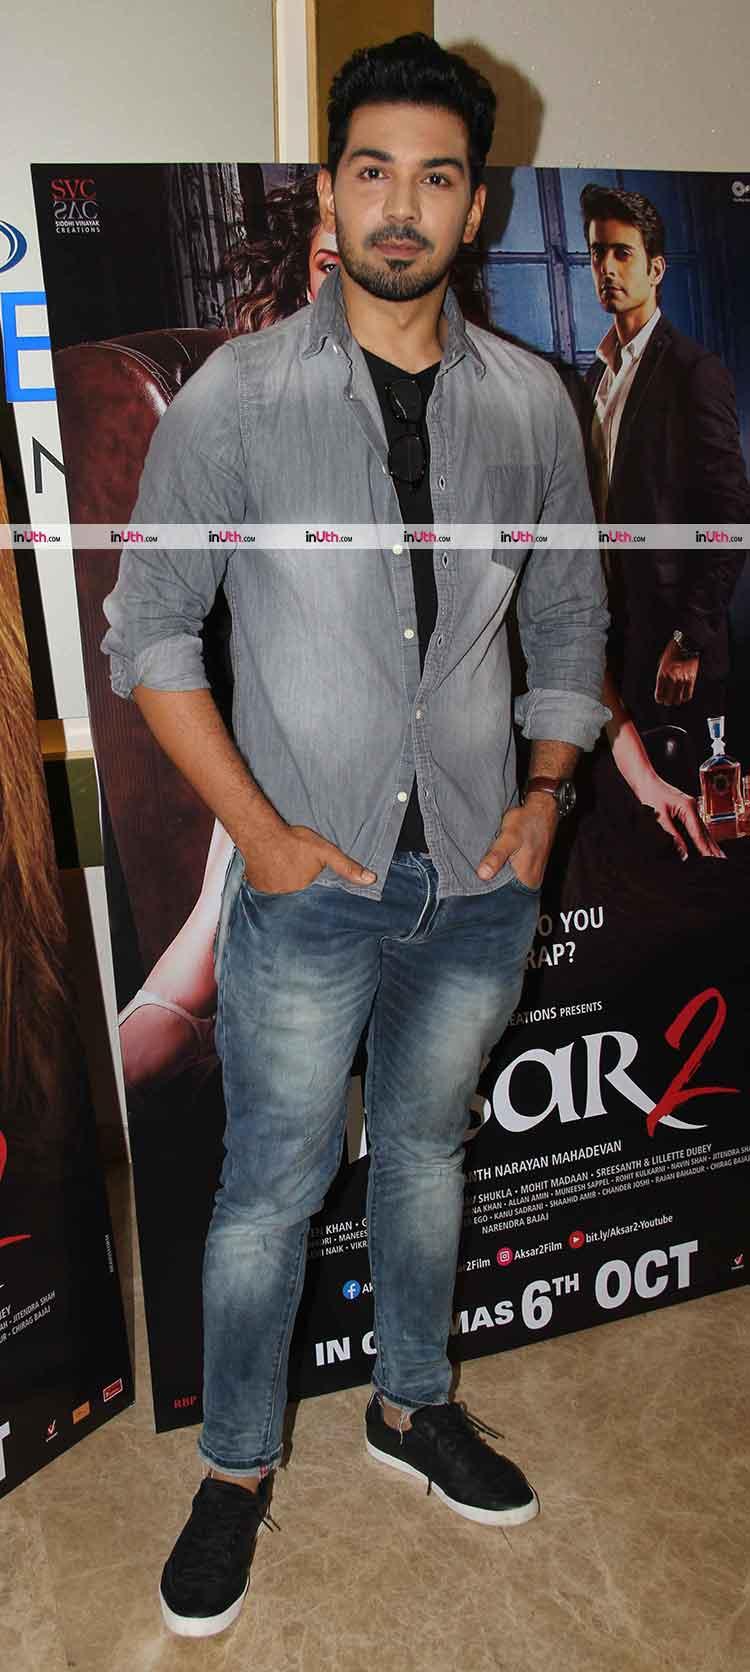 Abhinav Shukla at the trailer launch of Aksar 2